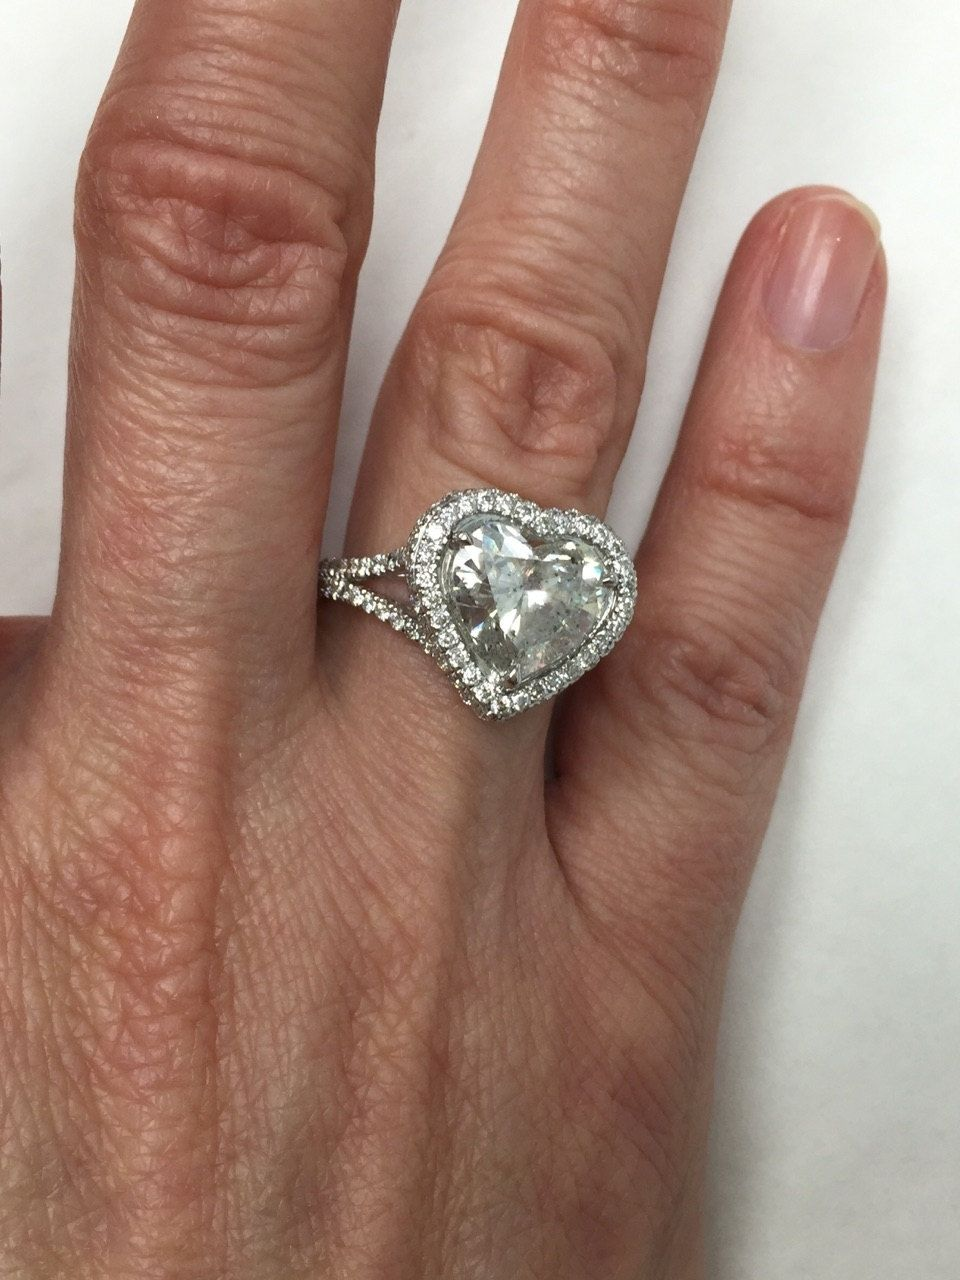 5 carat heart shaped diamond ring ring heart shaped. Black Bedroom Furniture Sets. Home Design Ideas